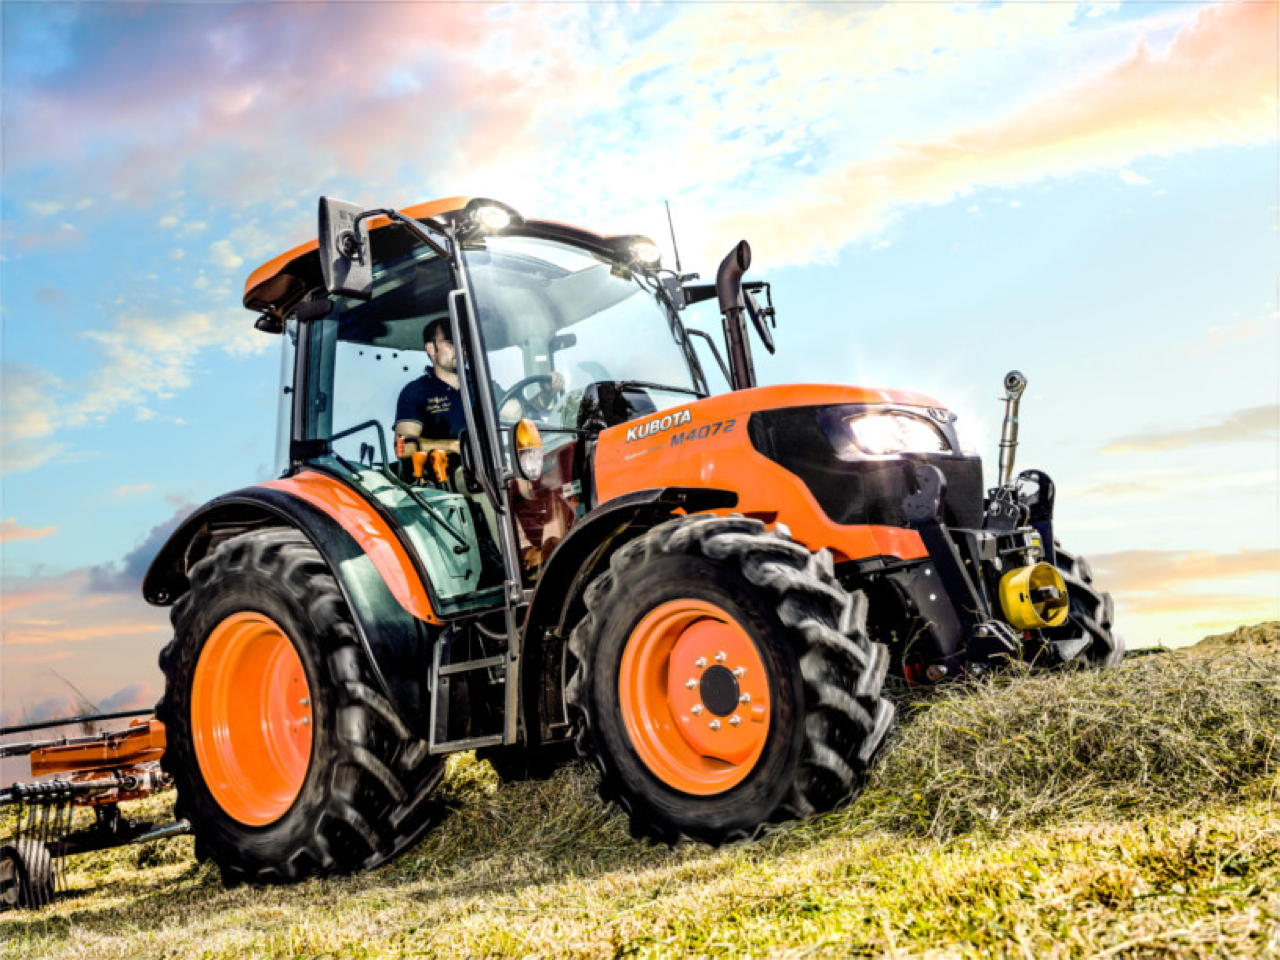 Kubota - Tractors & farm machinery on Macgest